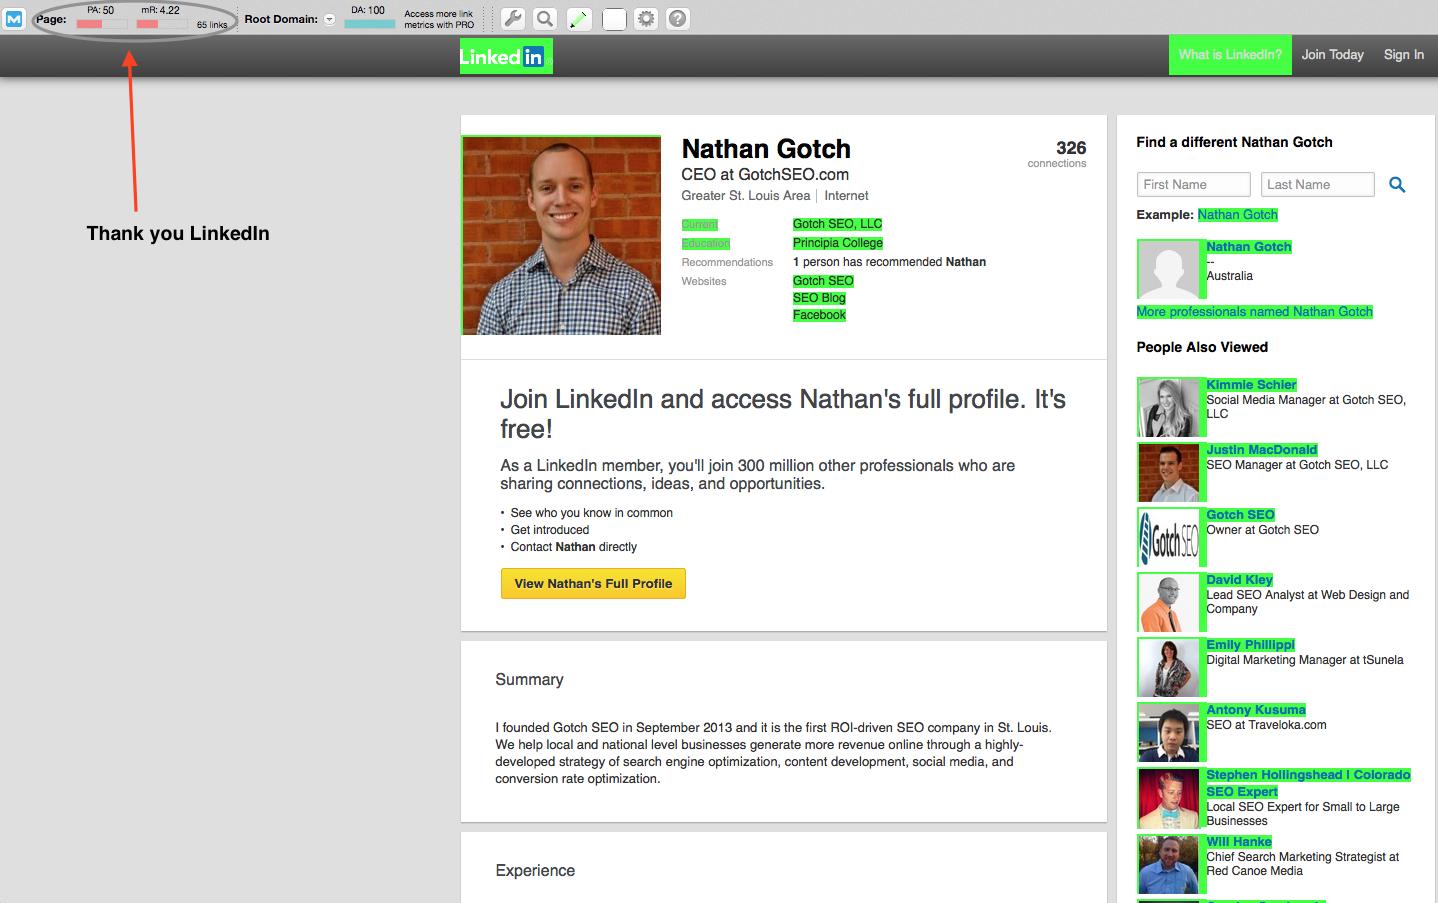 Nathan Gotch LinkedIn